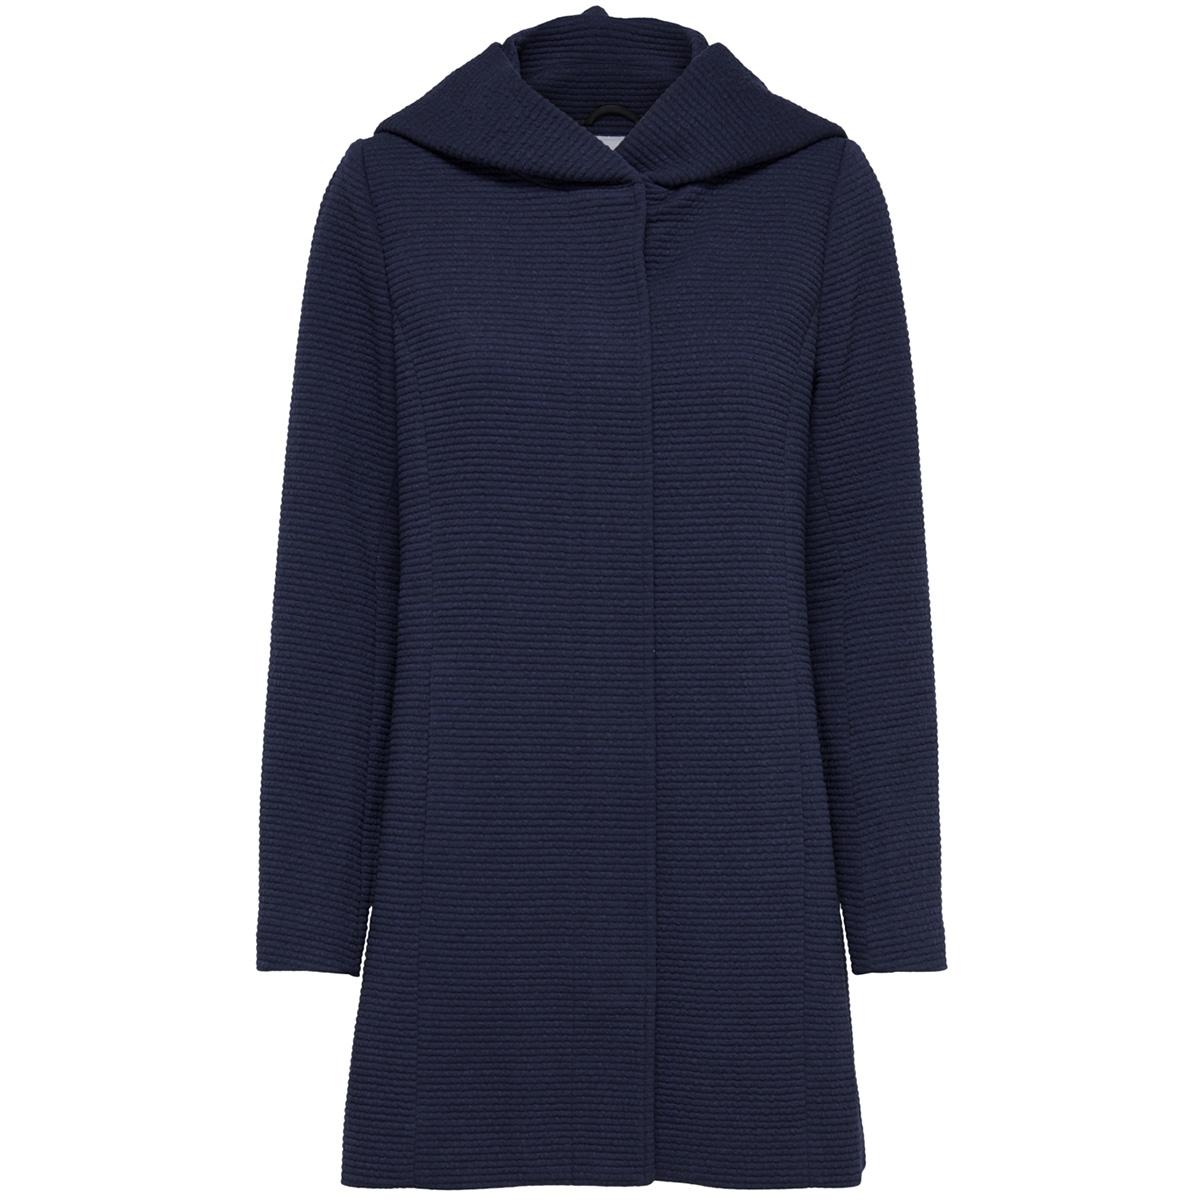 onlsedona link spring coat cc otw 15167850 only jas black iris/melange